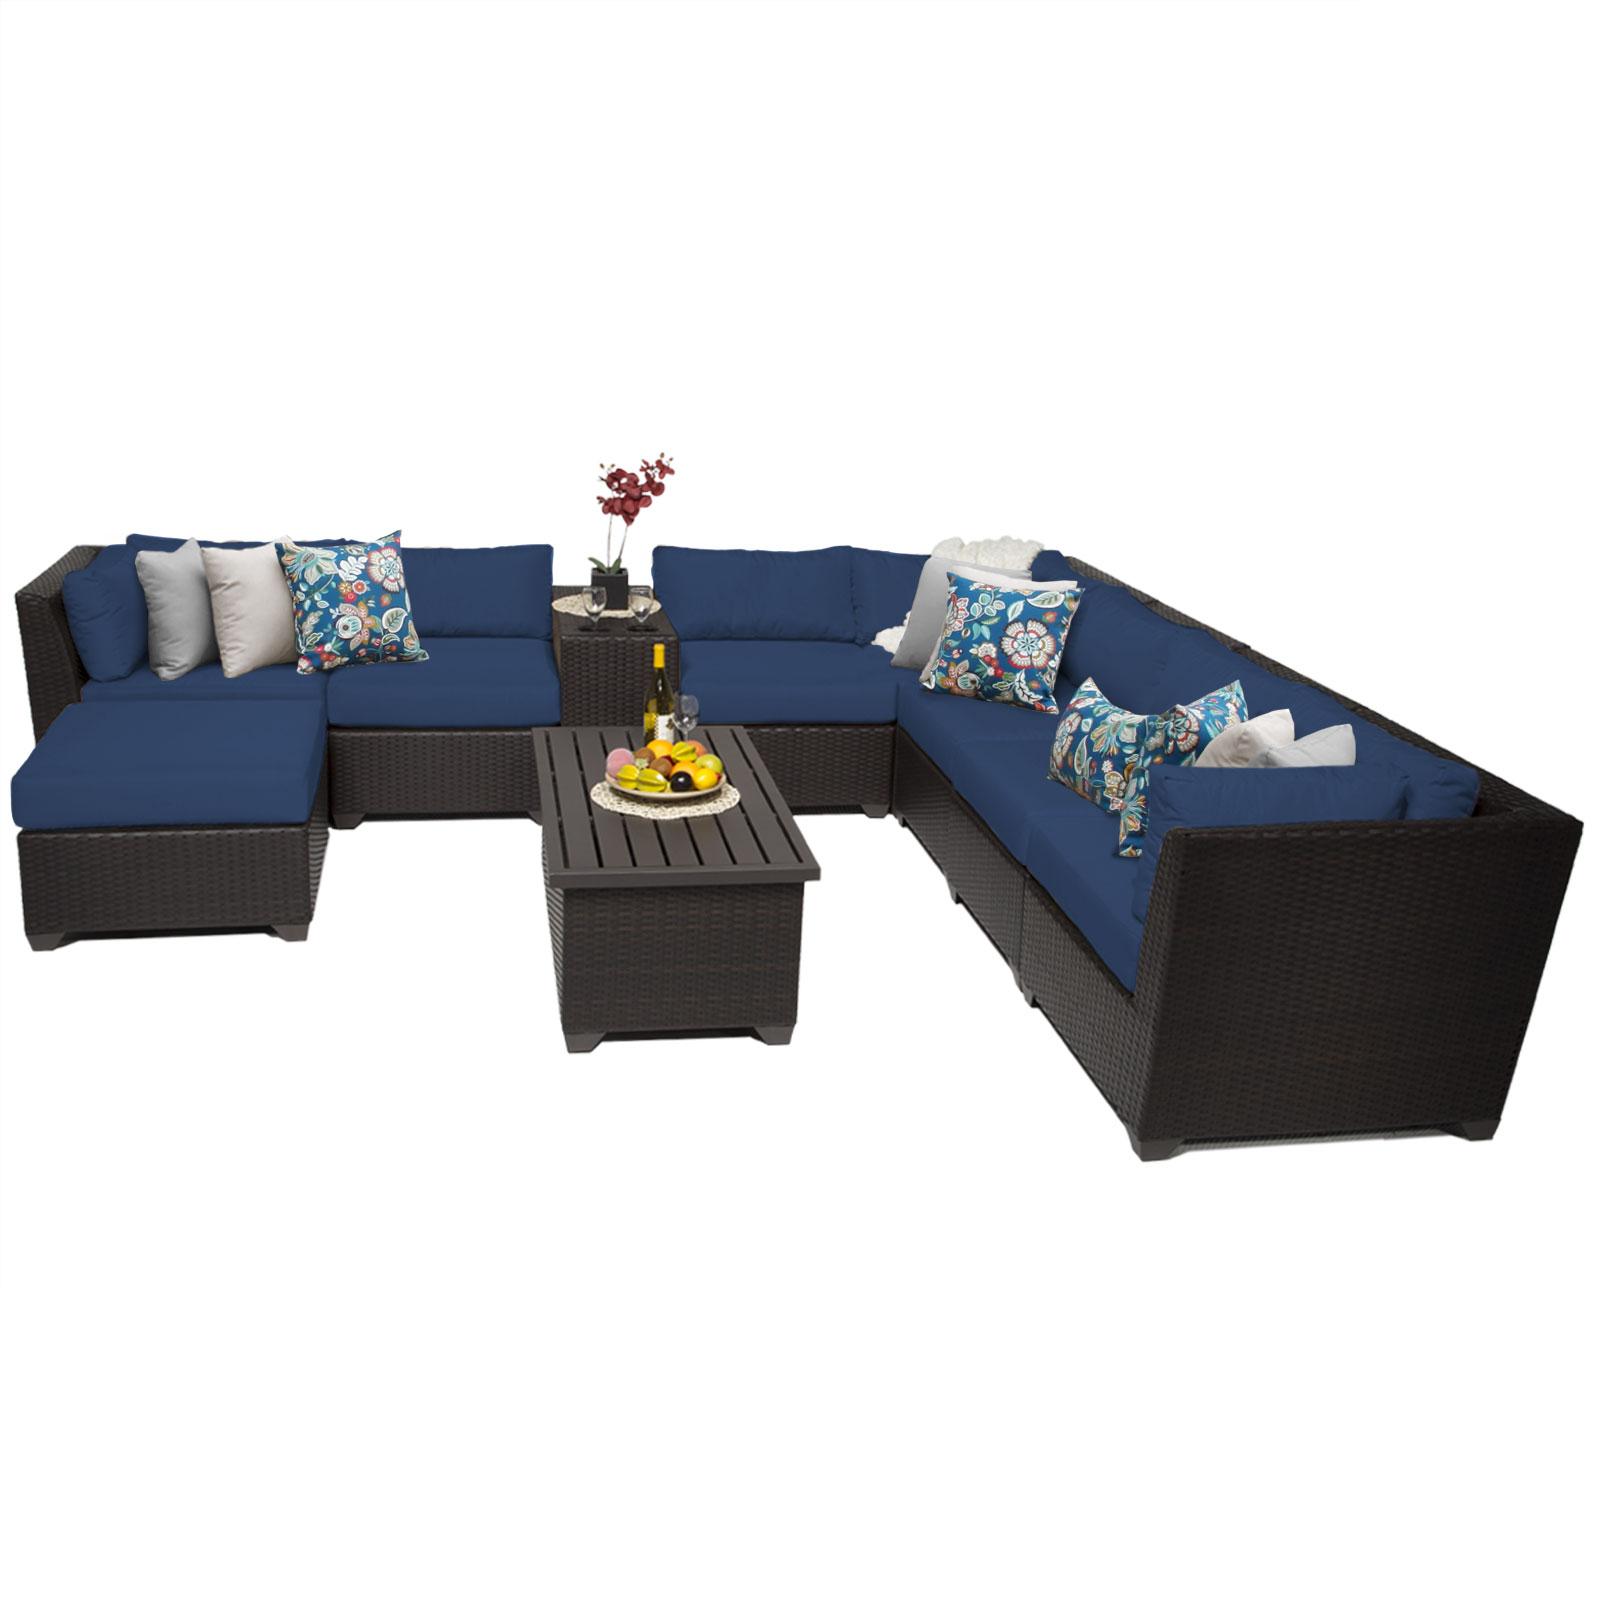 Bermuda 10 Piece Outdoor Wicker Patio Furniture Set 10b by TK Classics